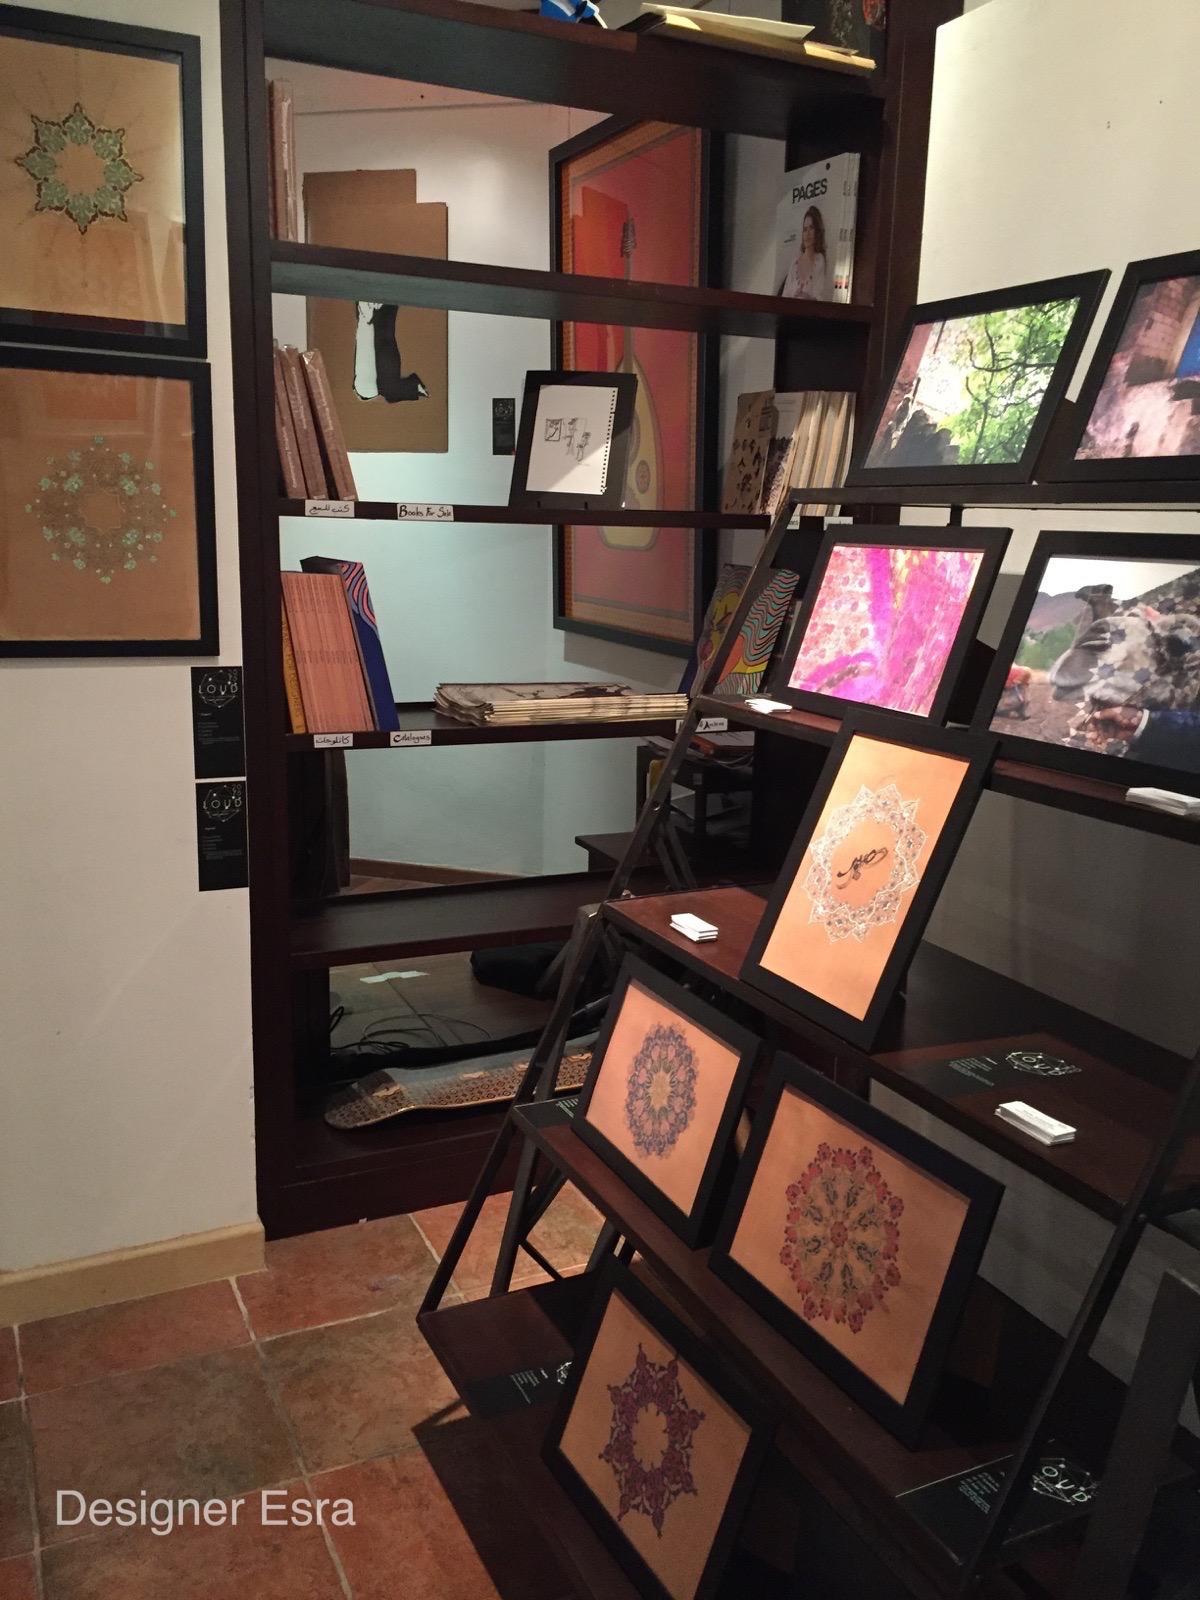 Esra Alhamal's Exhibited Work